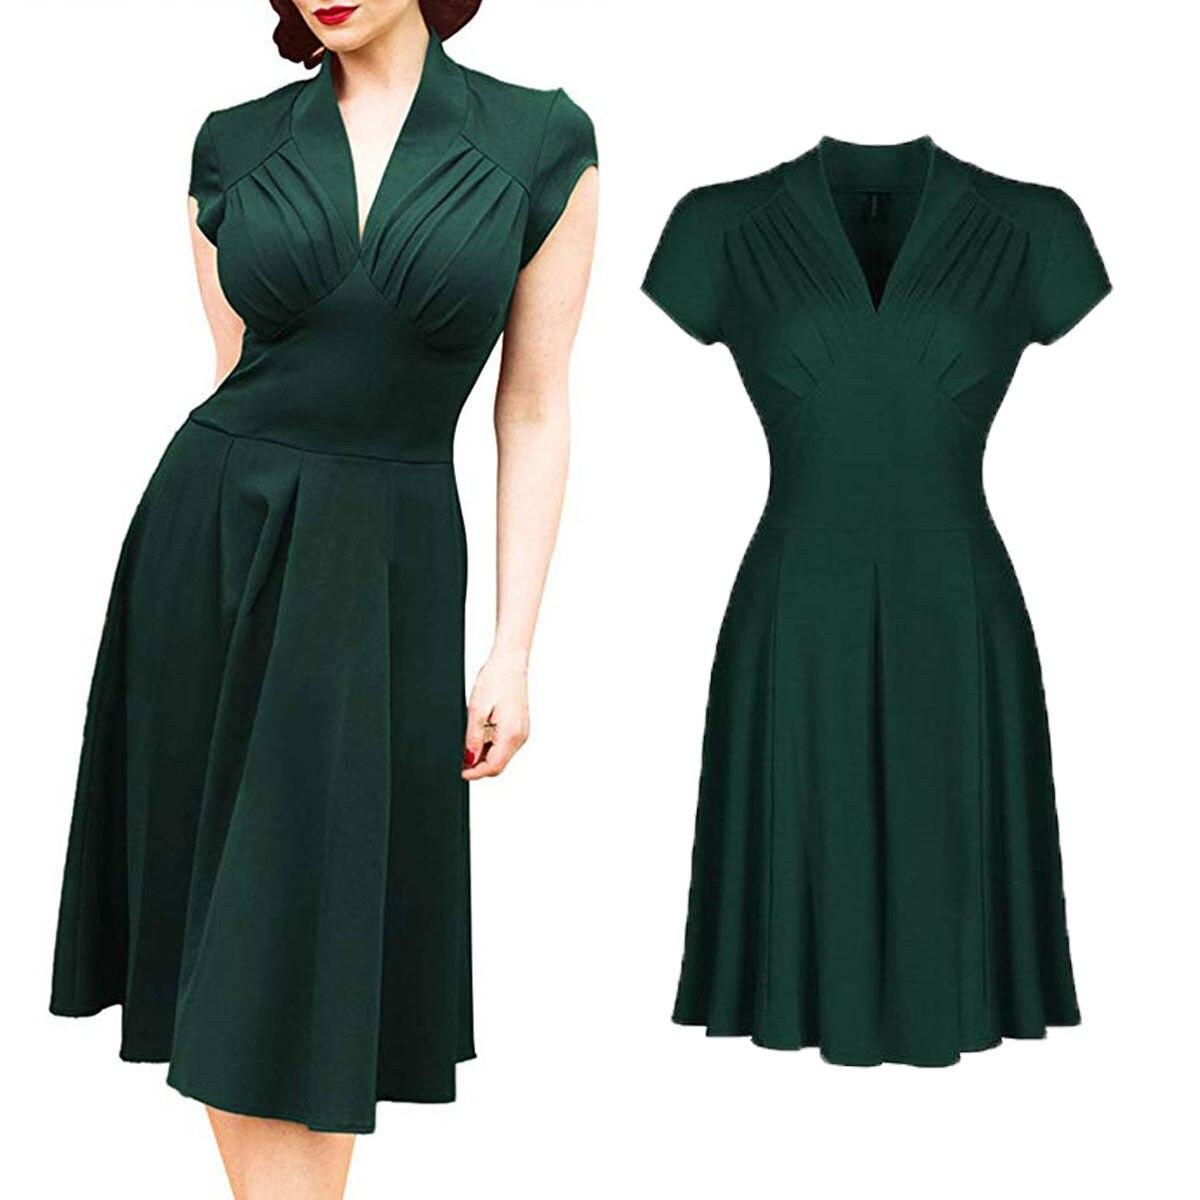 Vestido vintage feminino 50s 60s retro rockabilly pinup dona de casa festa balanço chá vestidos elegantes vestido formal